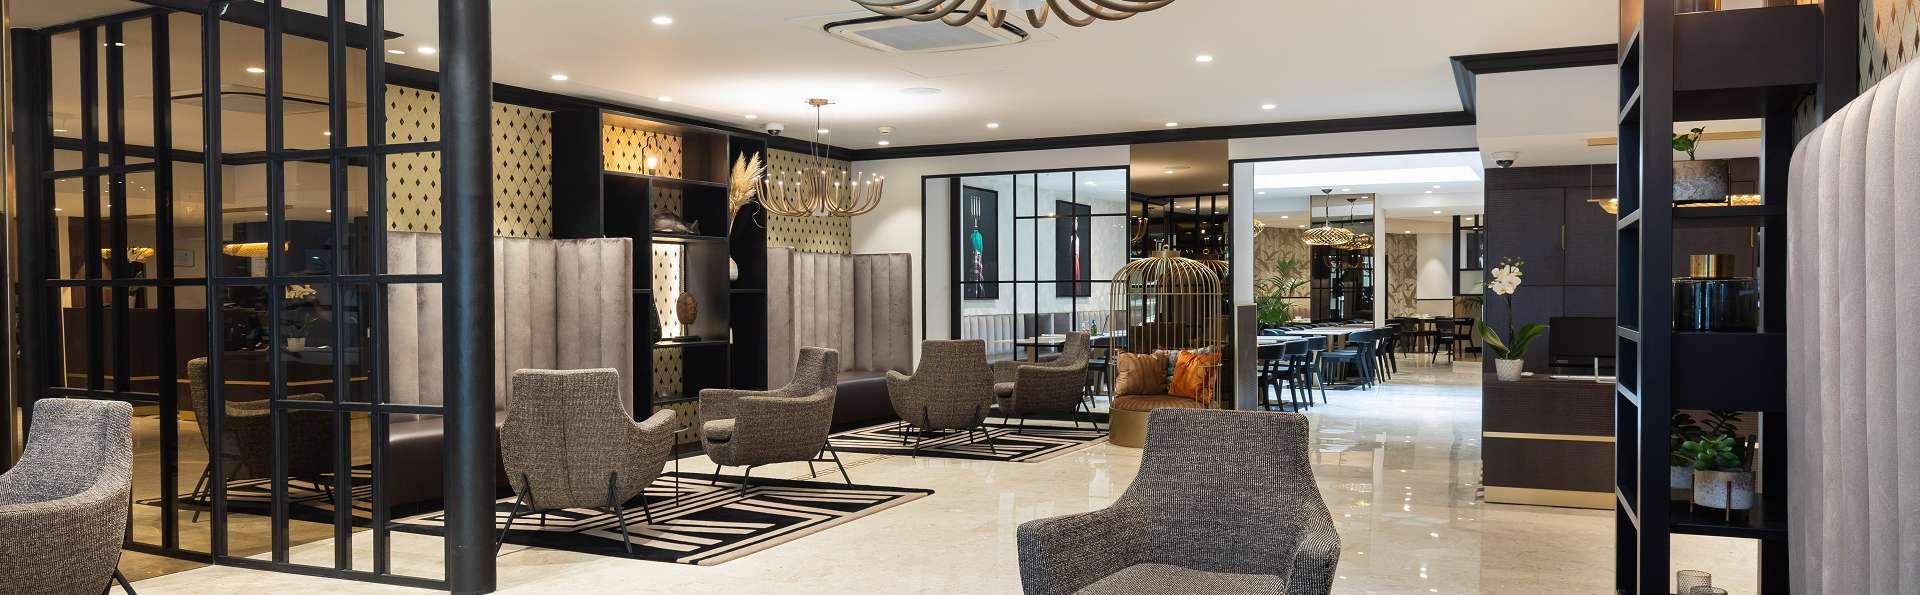 Best Western Plus Hotel Massena Nice  - BW_Plus_Massena_Lobby__2_.jpg